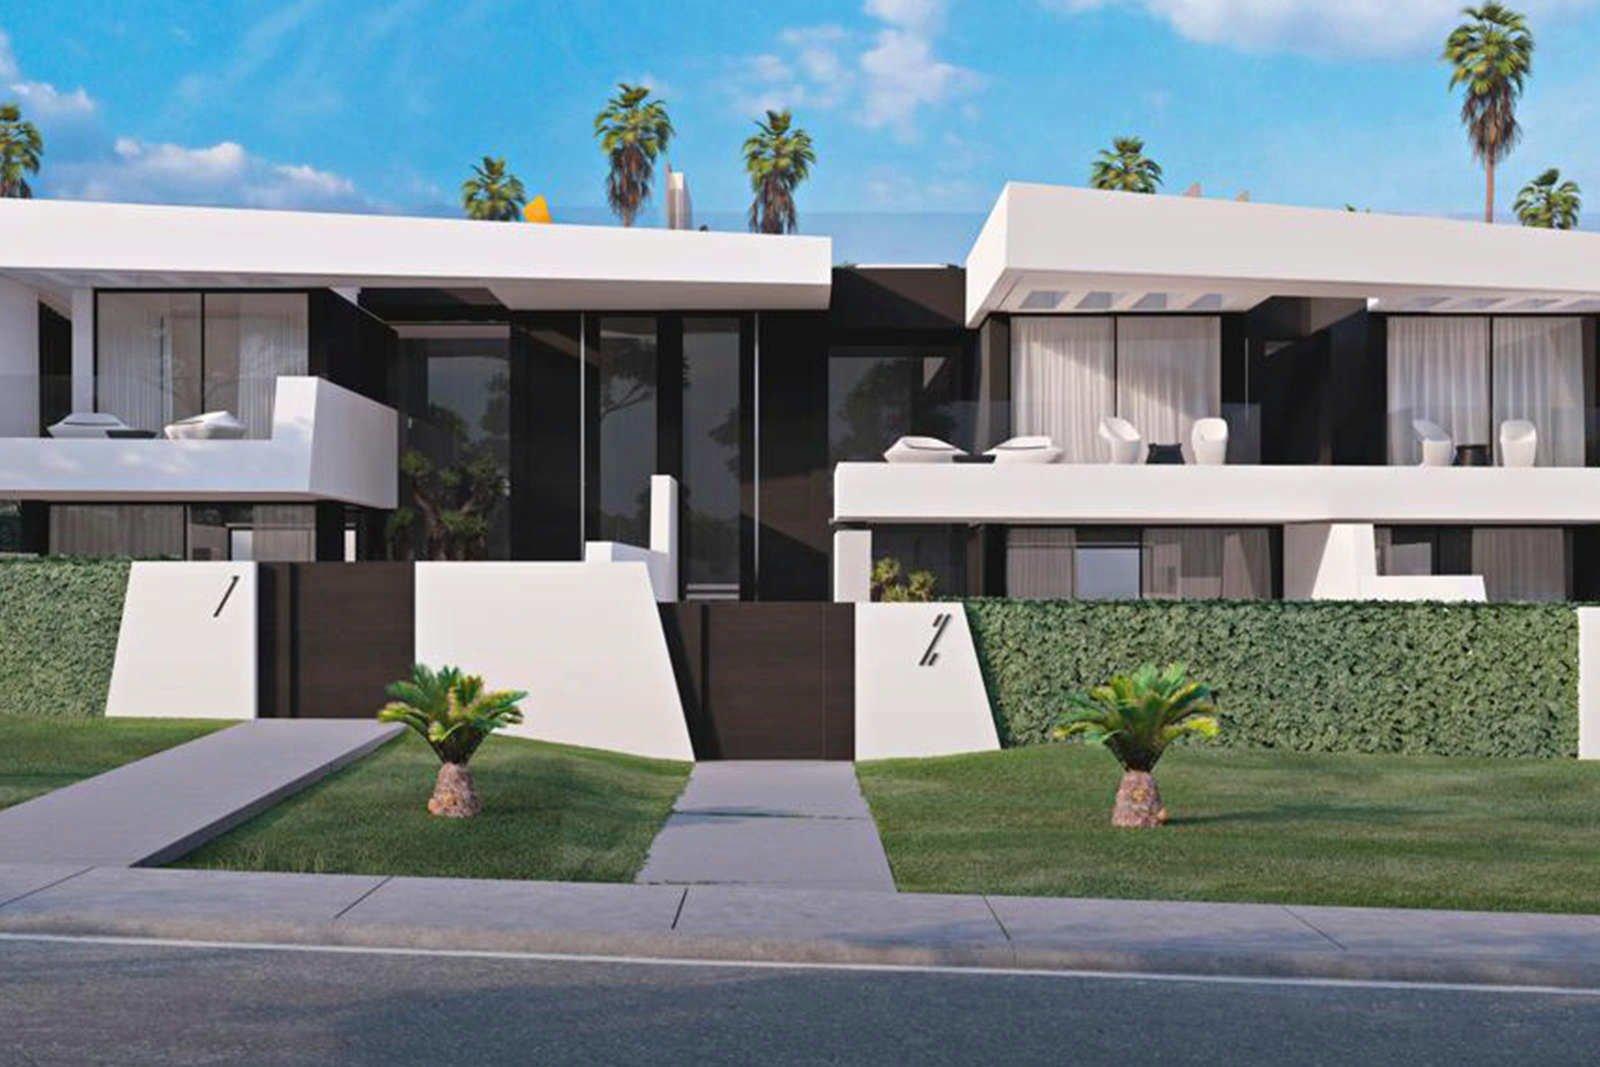 5 Bedroom Villa Vilamoura, Central Algarve Ref: PV3641A